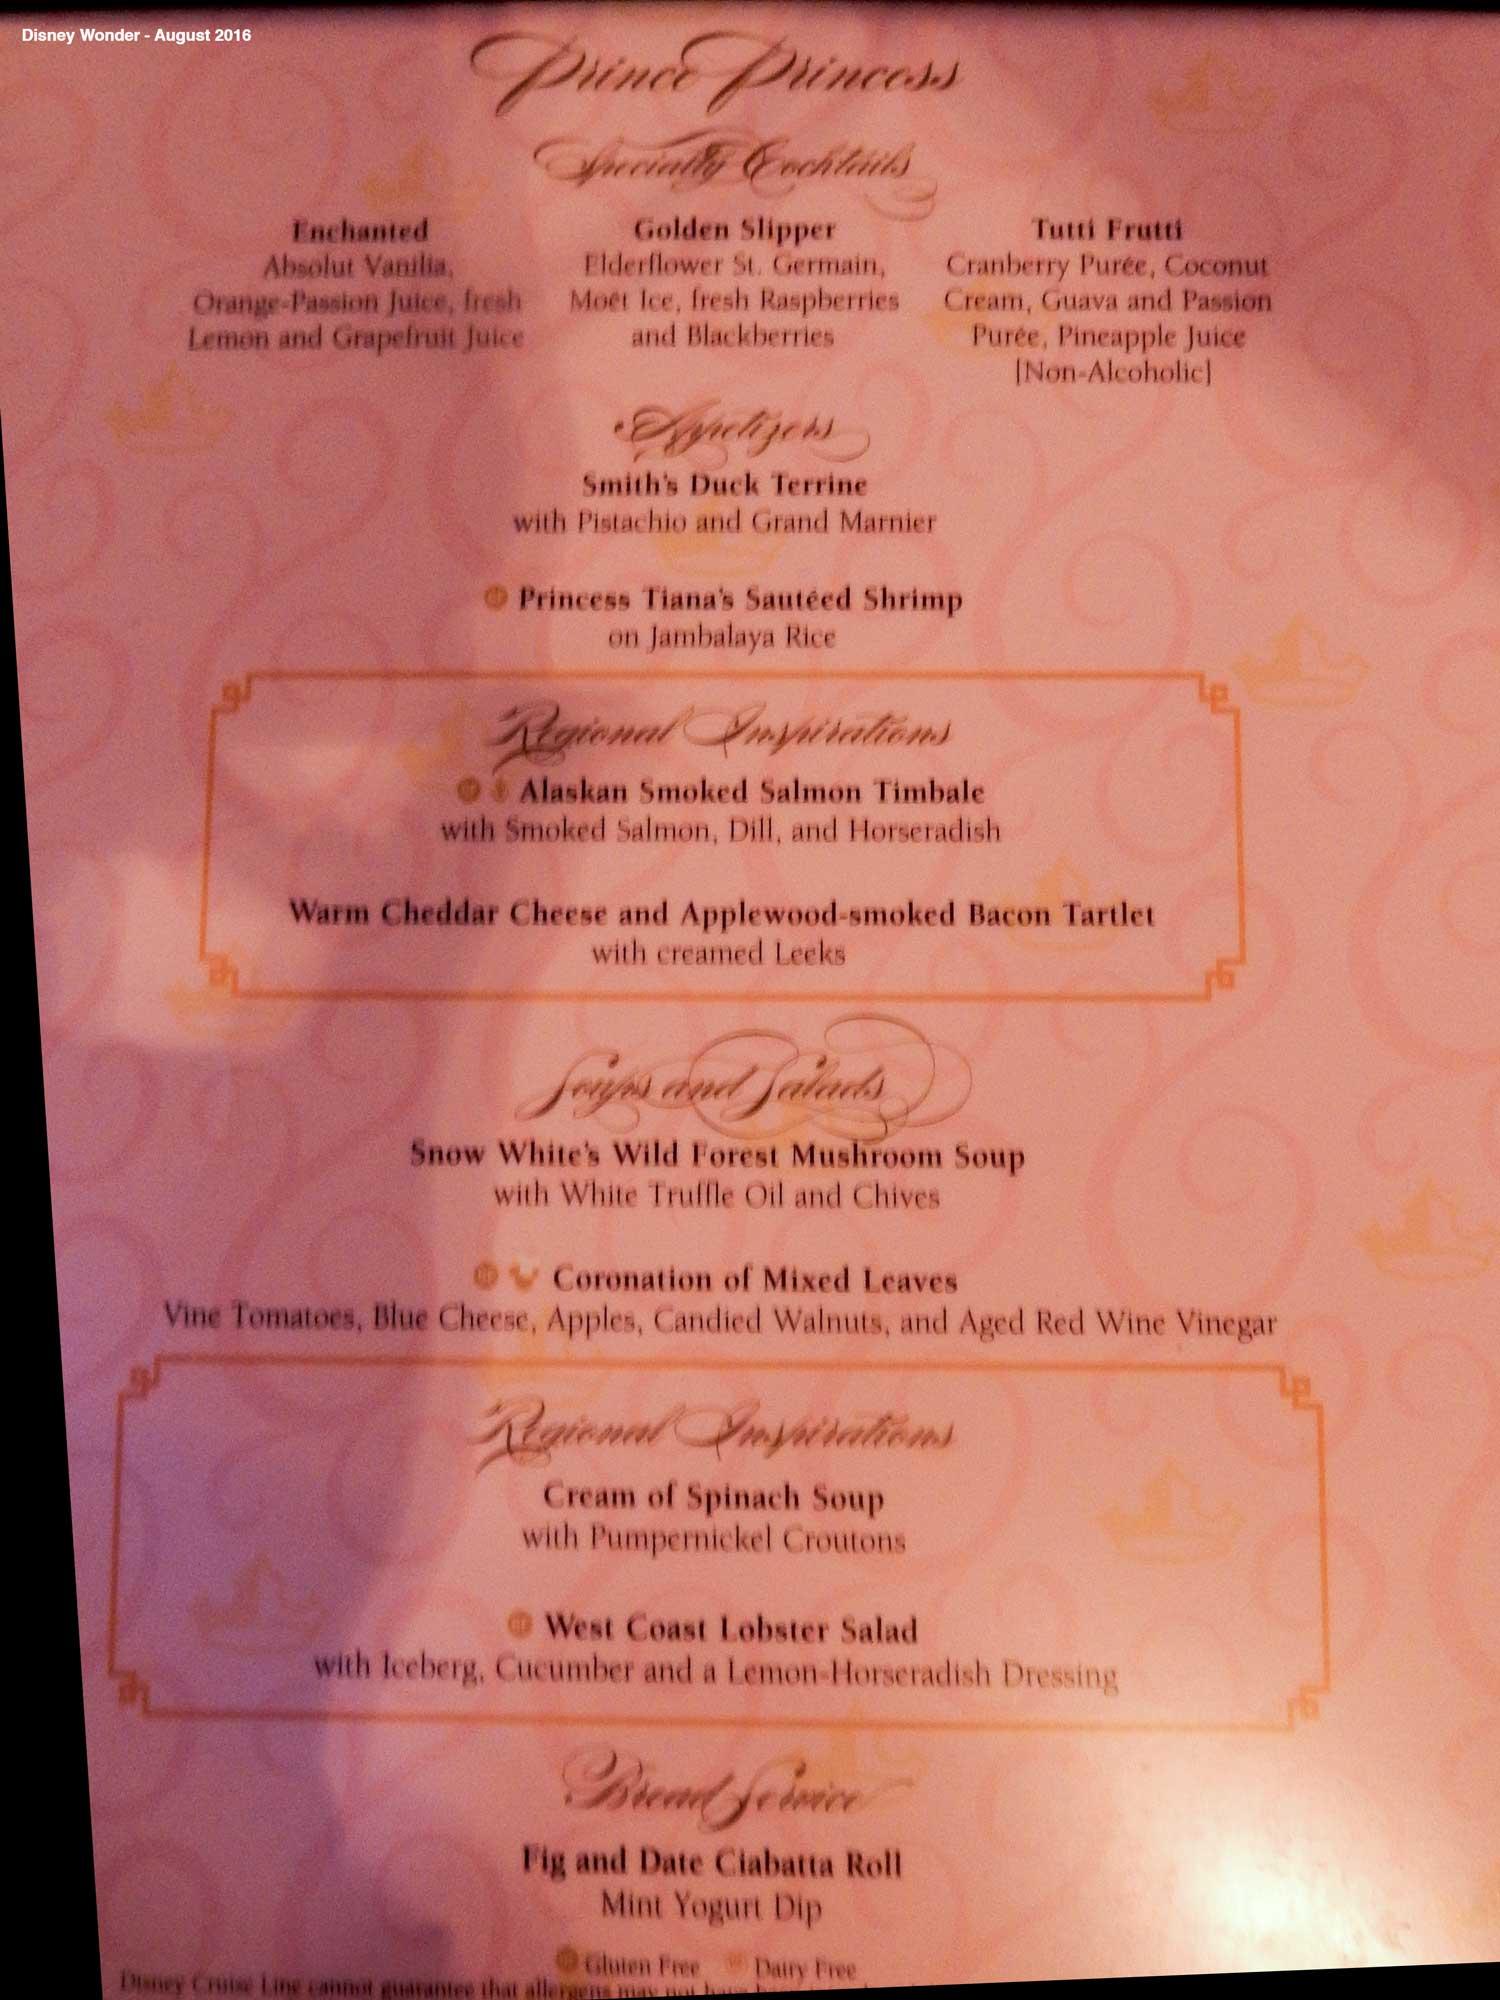 Prince Amp Princess Dinner Menu The Disney Cruise Line Blog